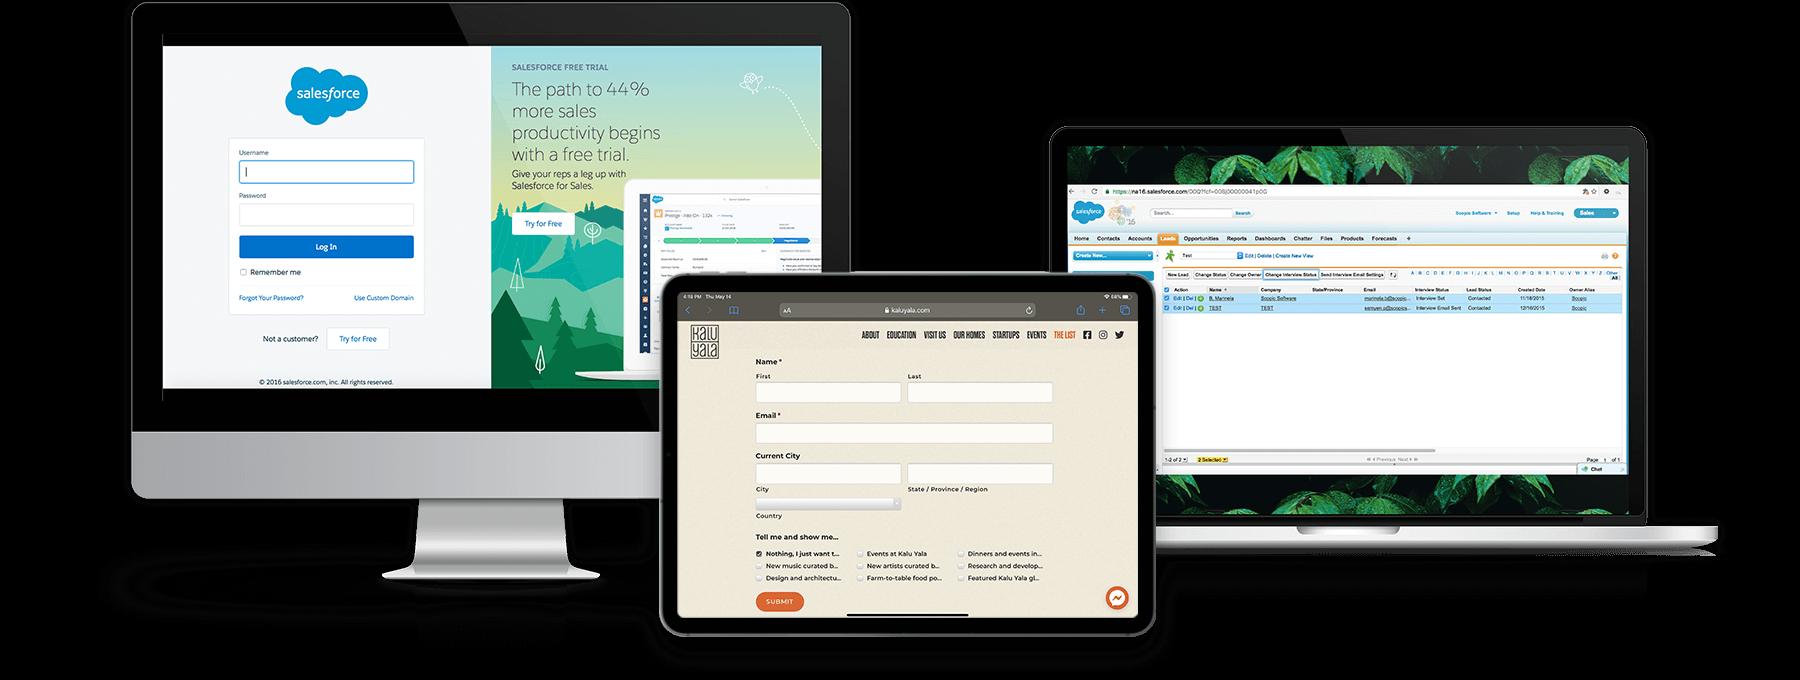 Kalu-Yala-Salesforce solution